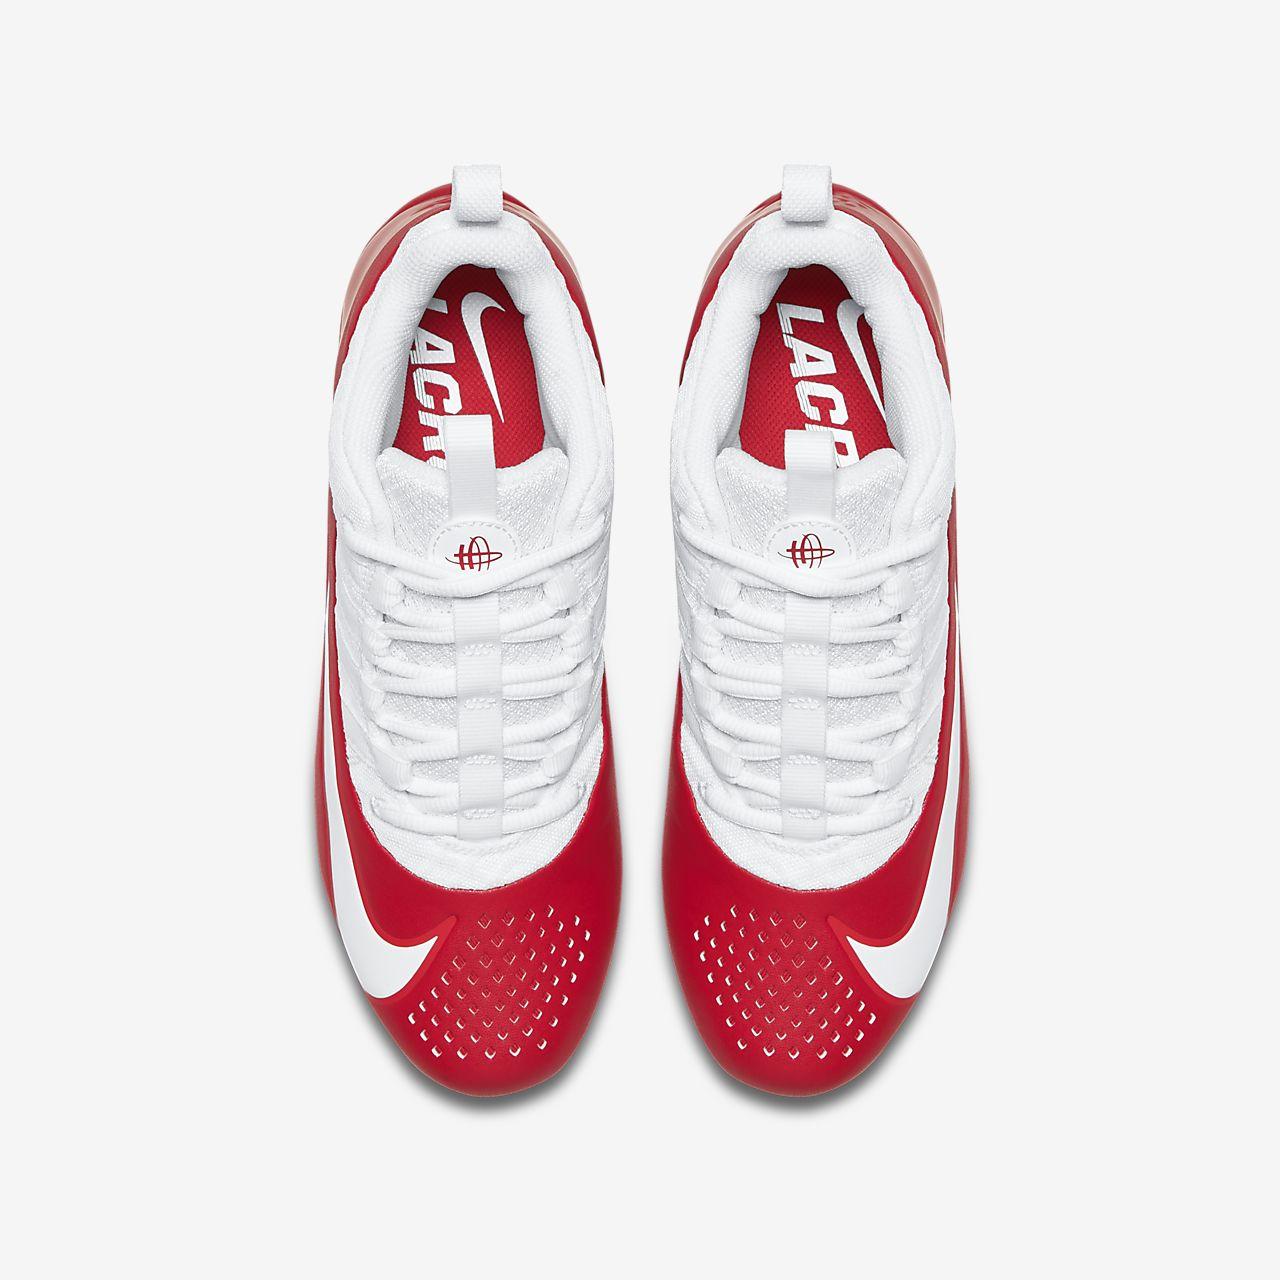 9388198198cf Nike Alpha Huarache 6 Big Kids  Lacrosse Cleat. Nike.com